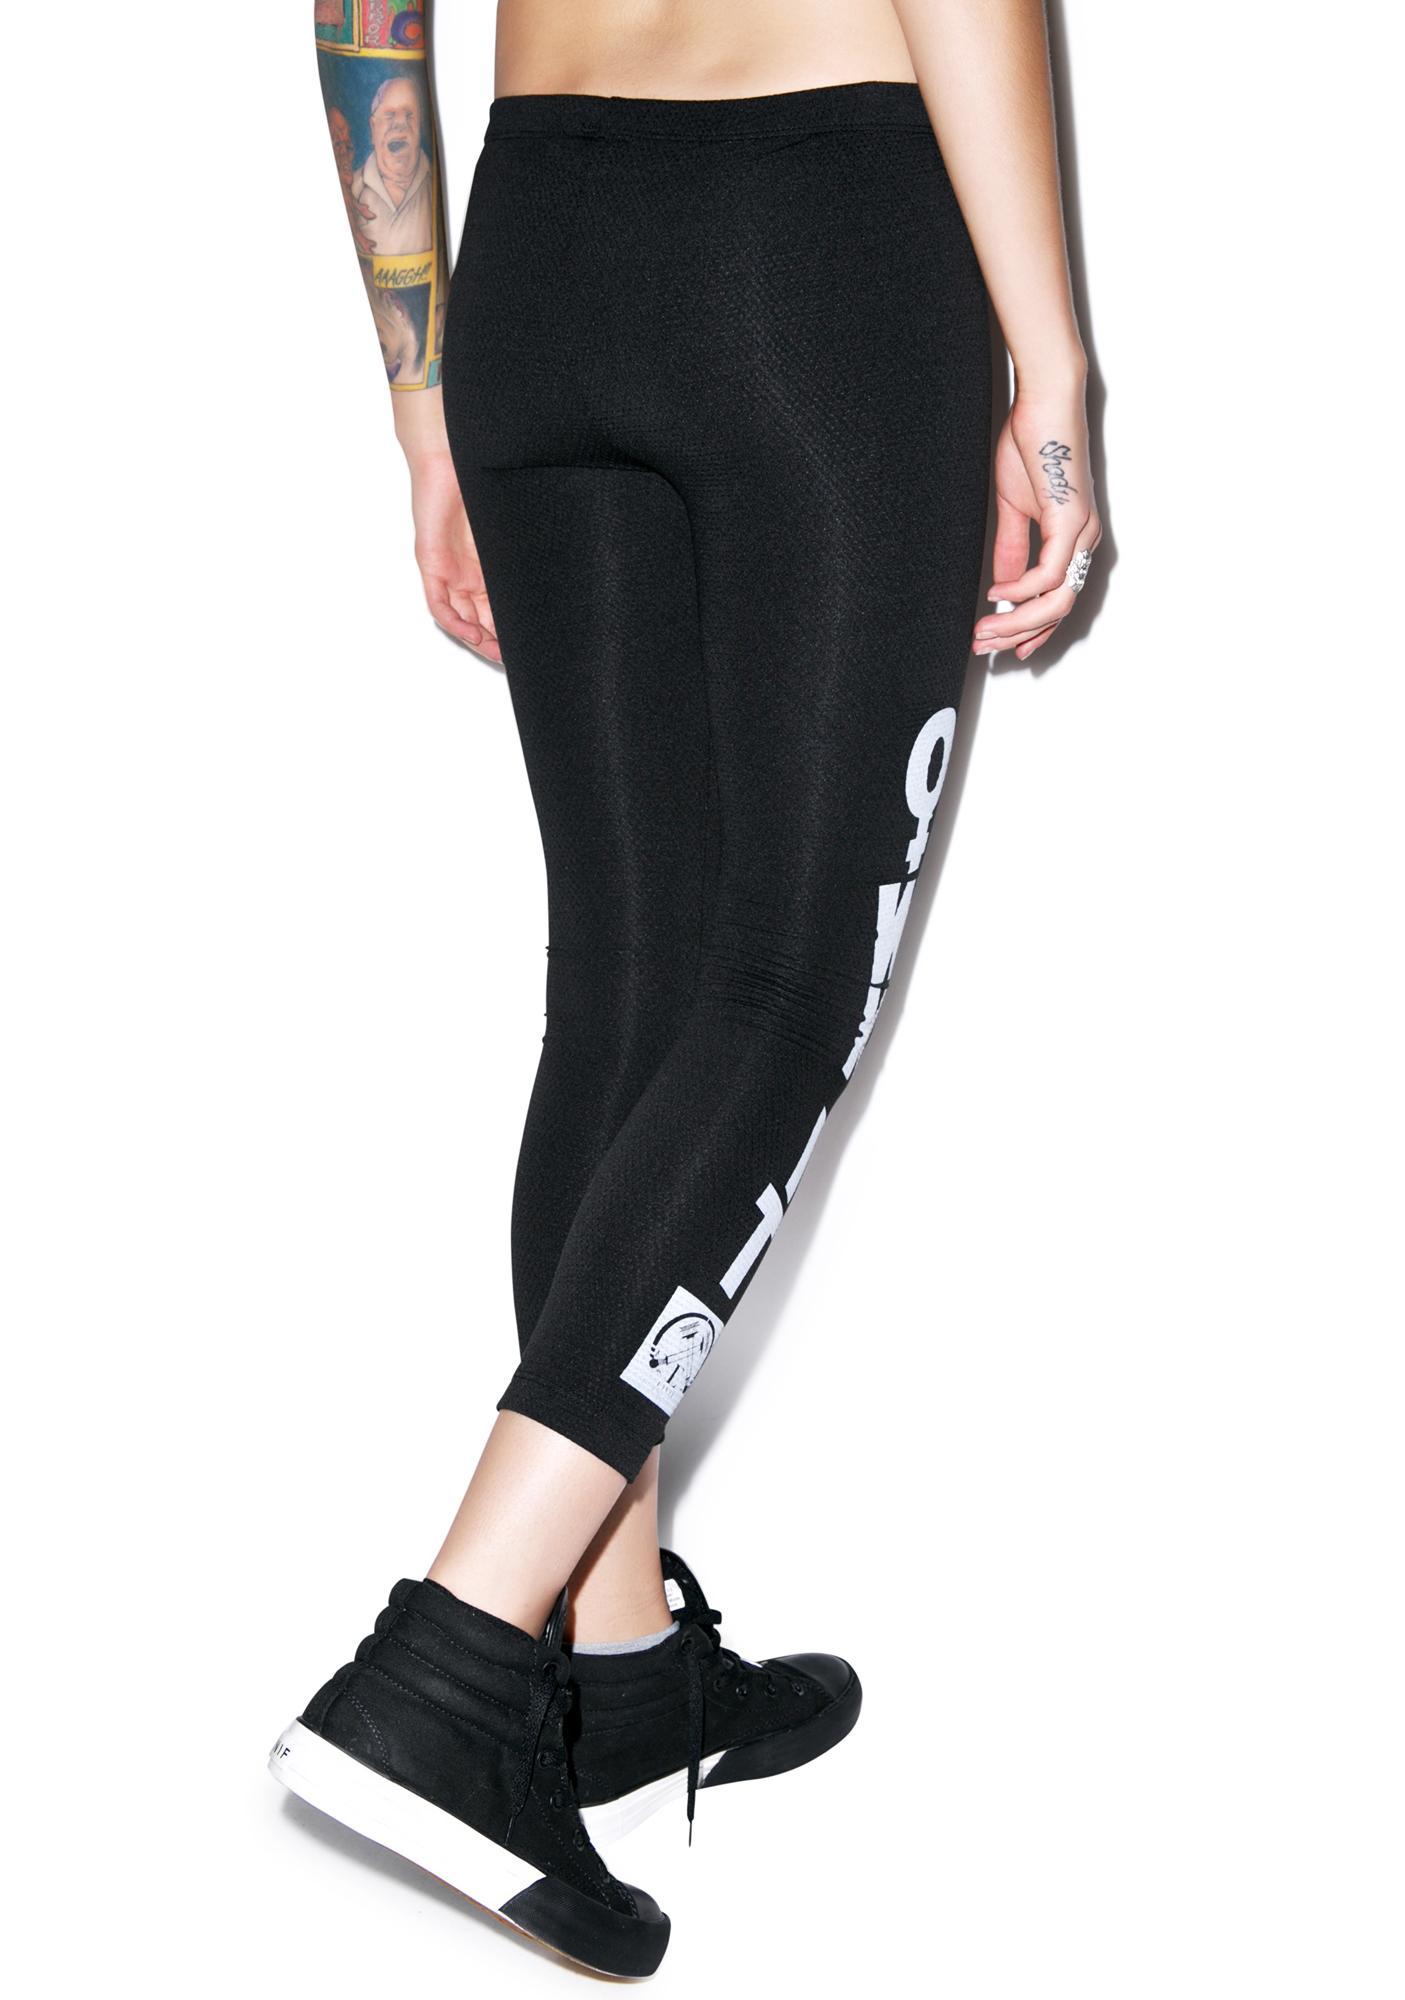 Civil Clothing Own It Mesh Leggings